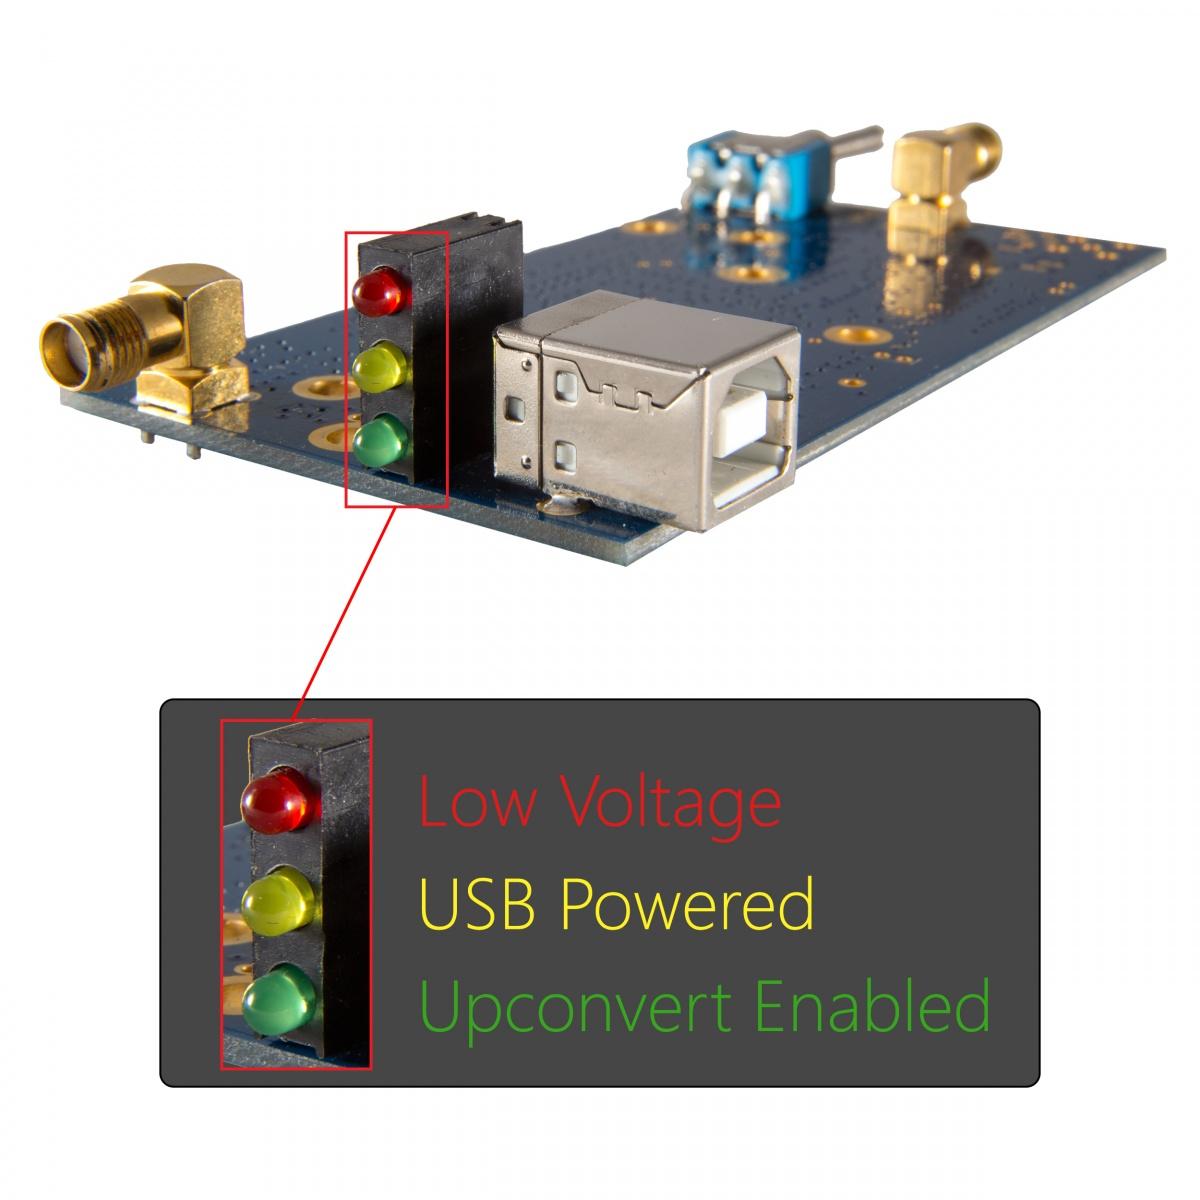 Nooelec Ham It Up V13 Barebones Hf Upconverter Usbpowered Pic Programmer Circuit Diagram